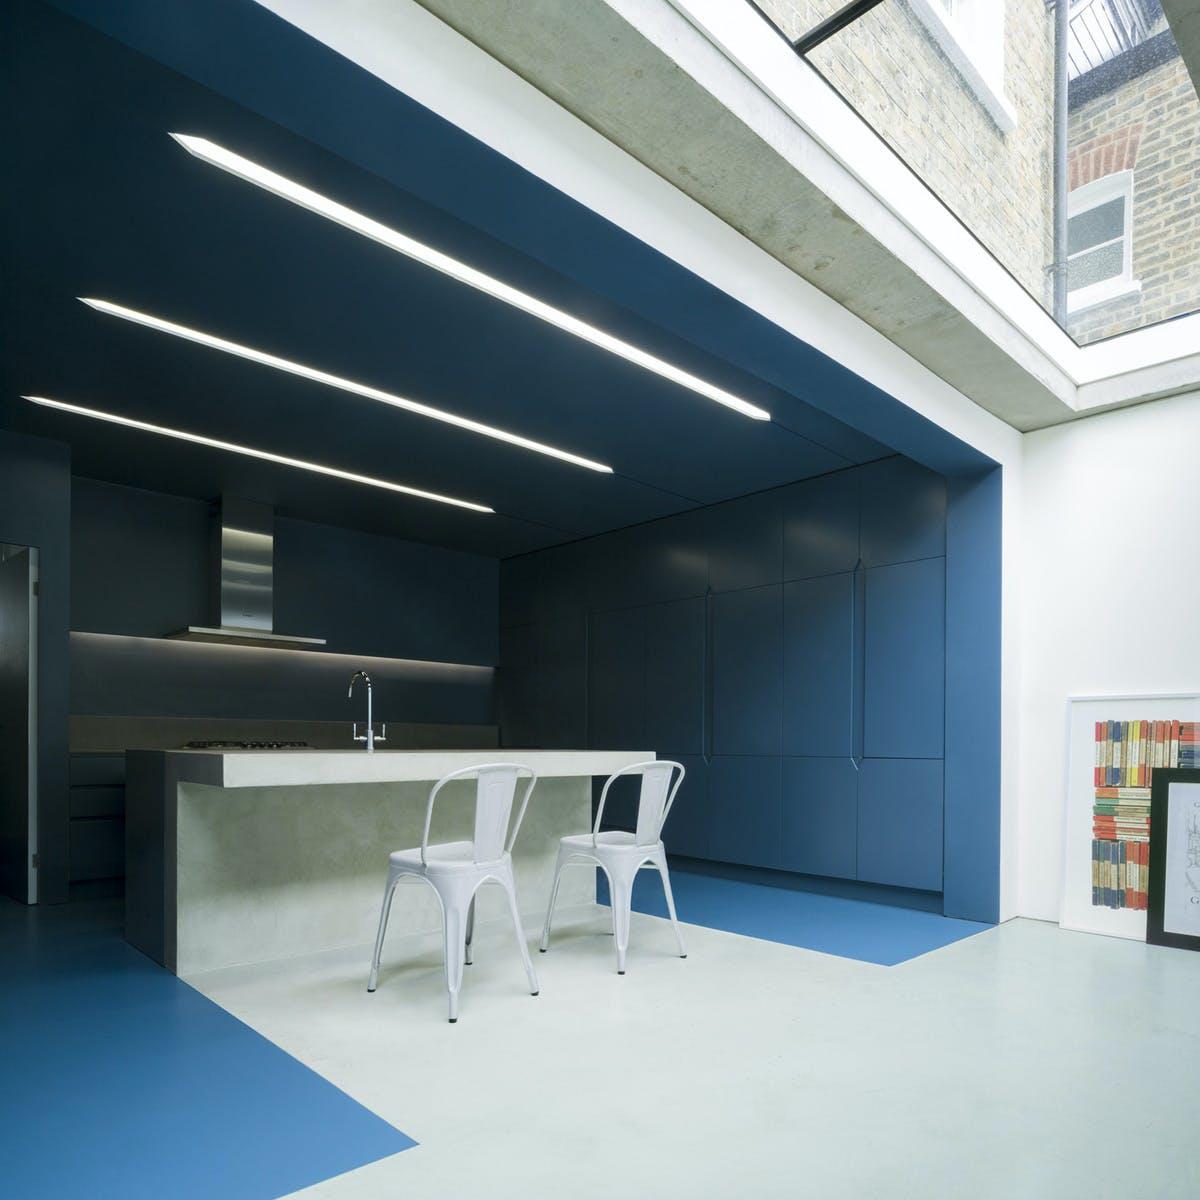 ten top images on archinect 39 s color pinterest board. Black Bedroom Furniture Sets. Home Design Ideas